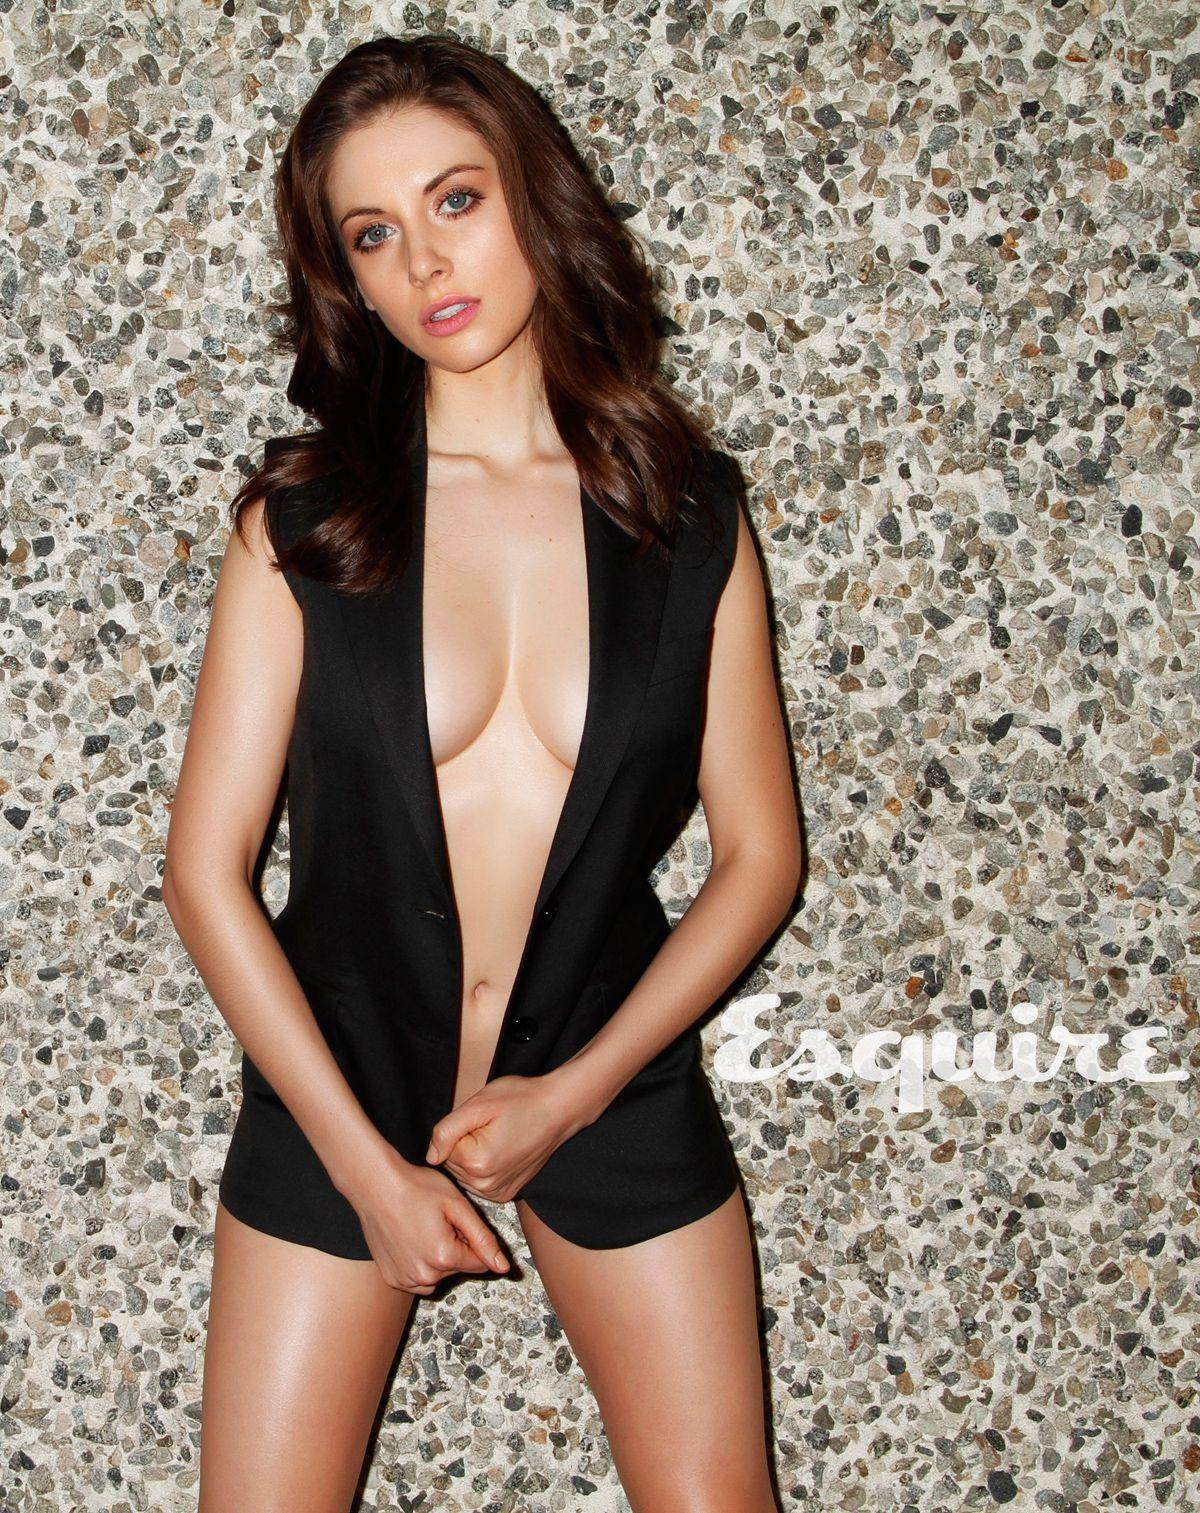 Alison Brie nude (69 photos), Topless, Leaked, Boobs, panties 2019